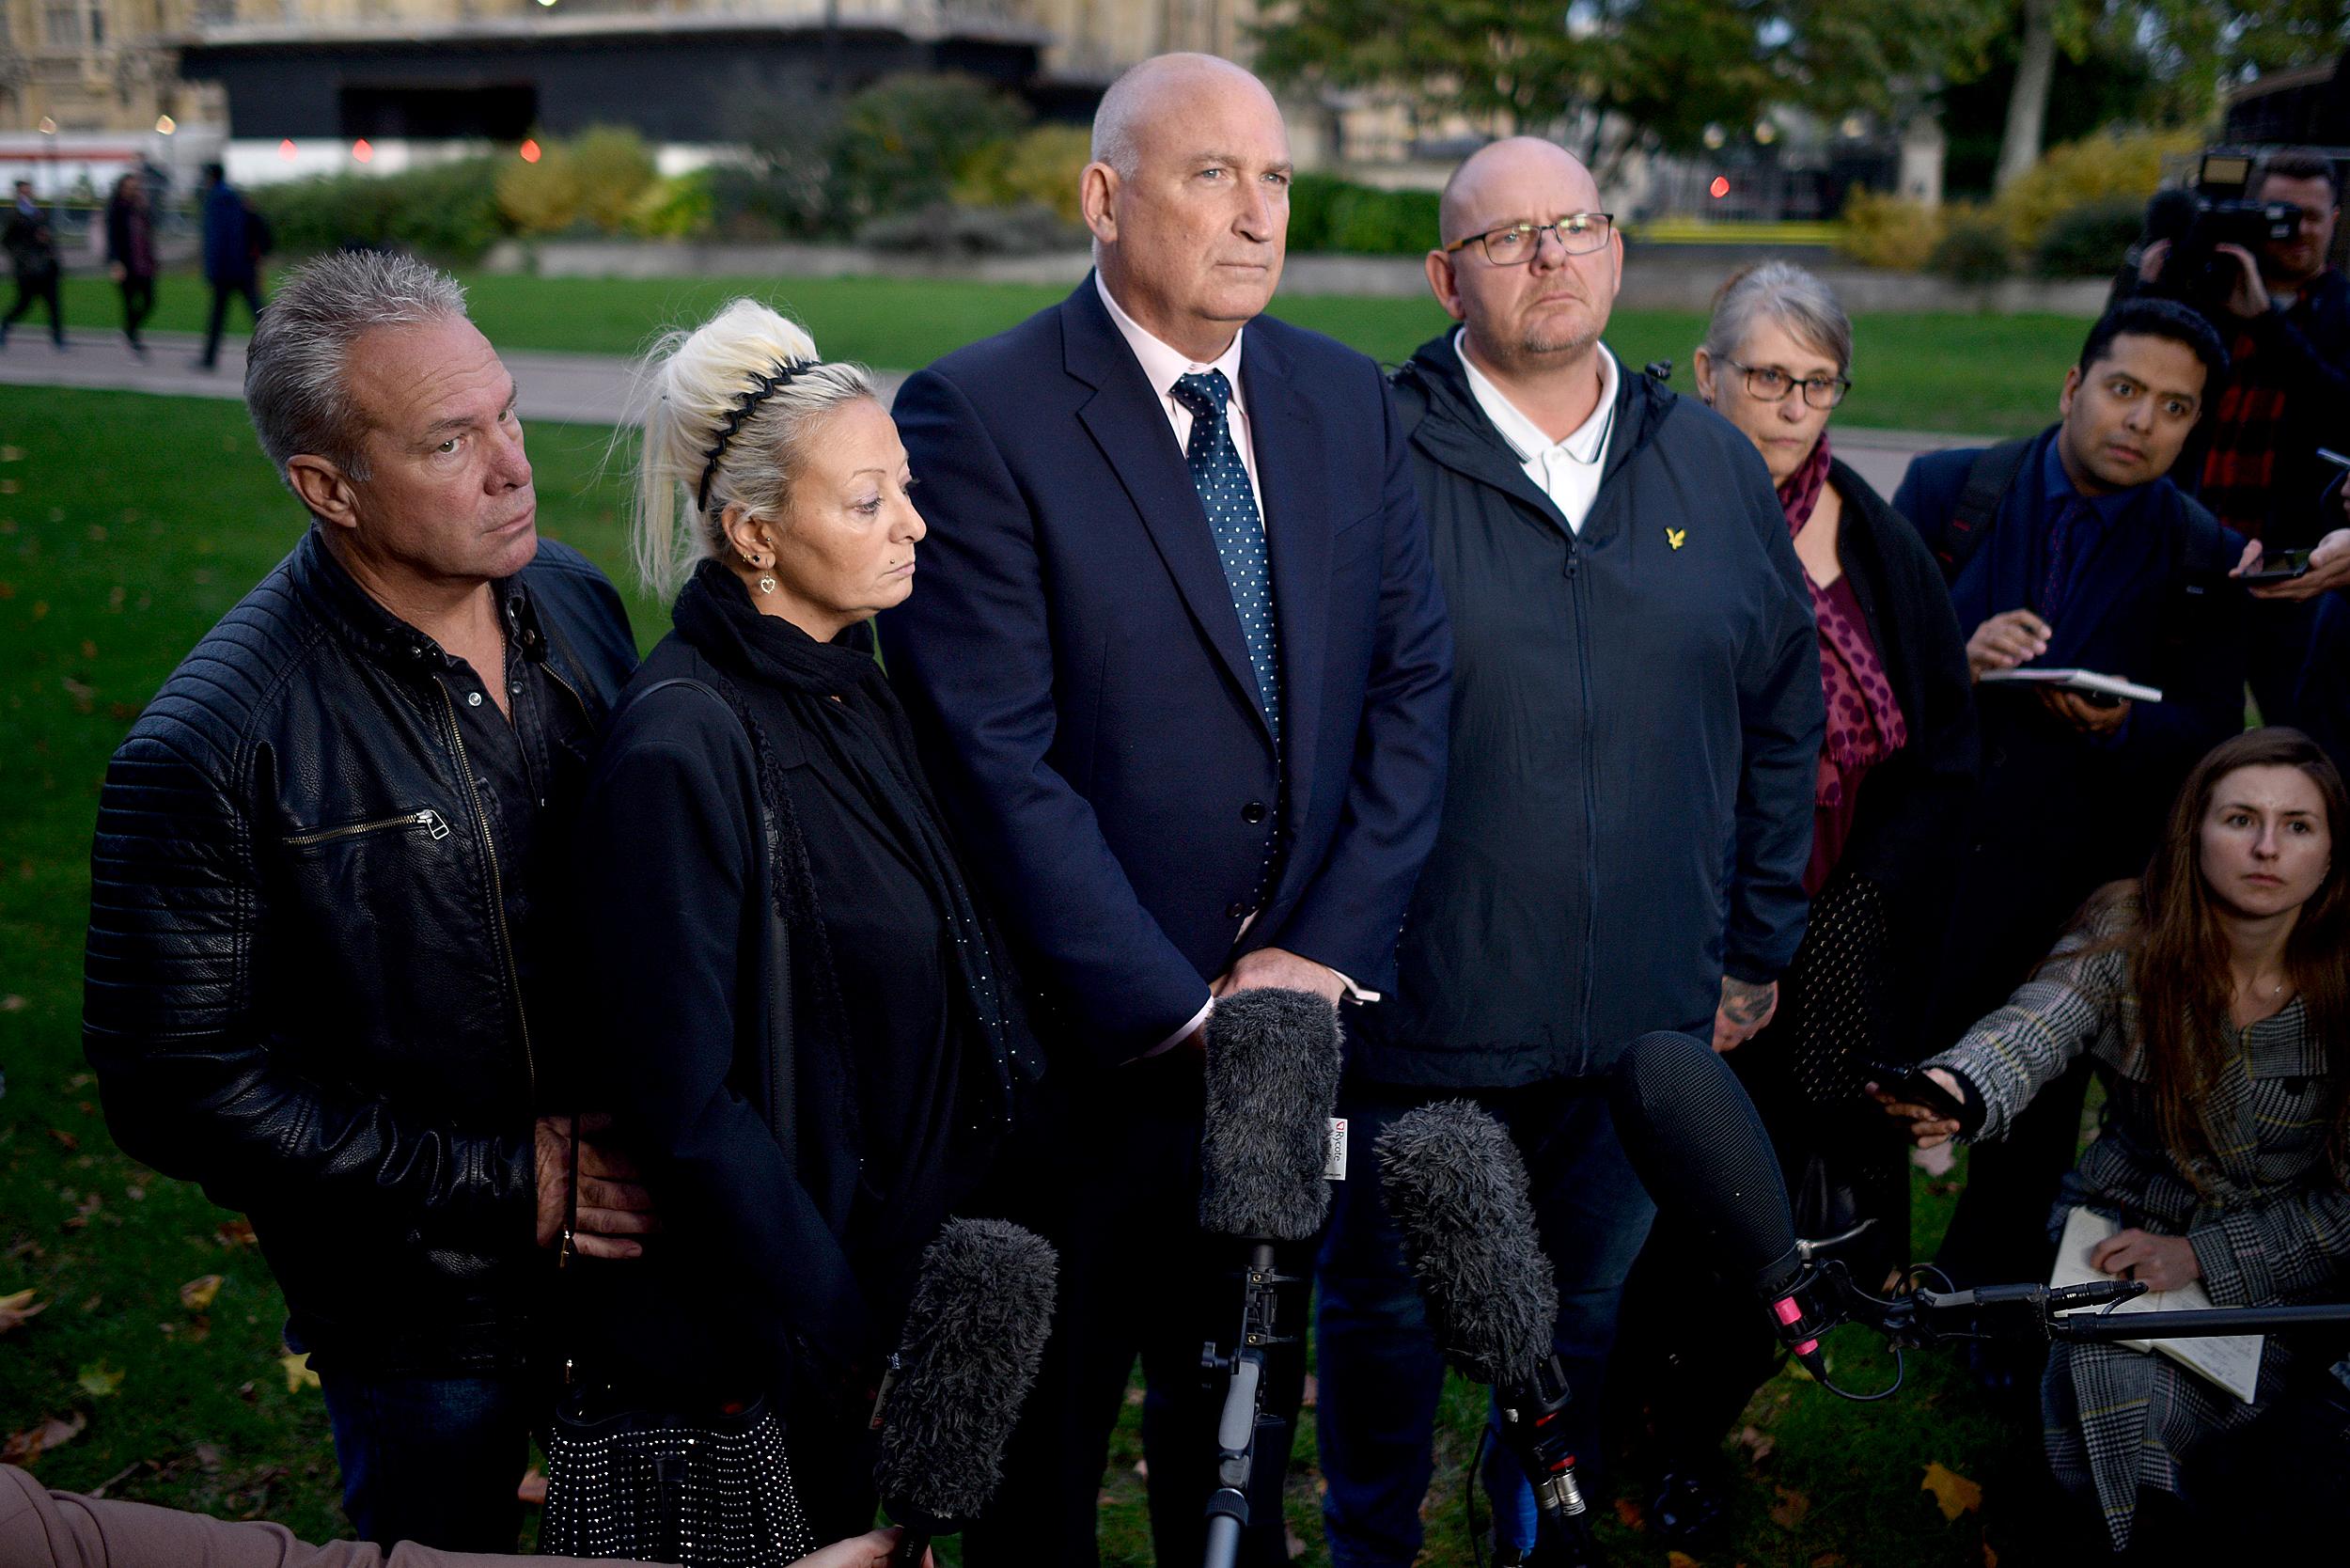 U.K. family resolve civil claim against U.S. diplomat's wife over fatal crash